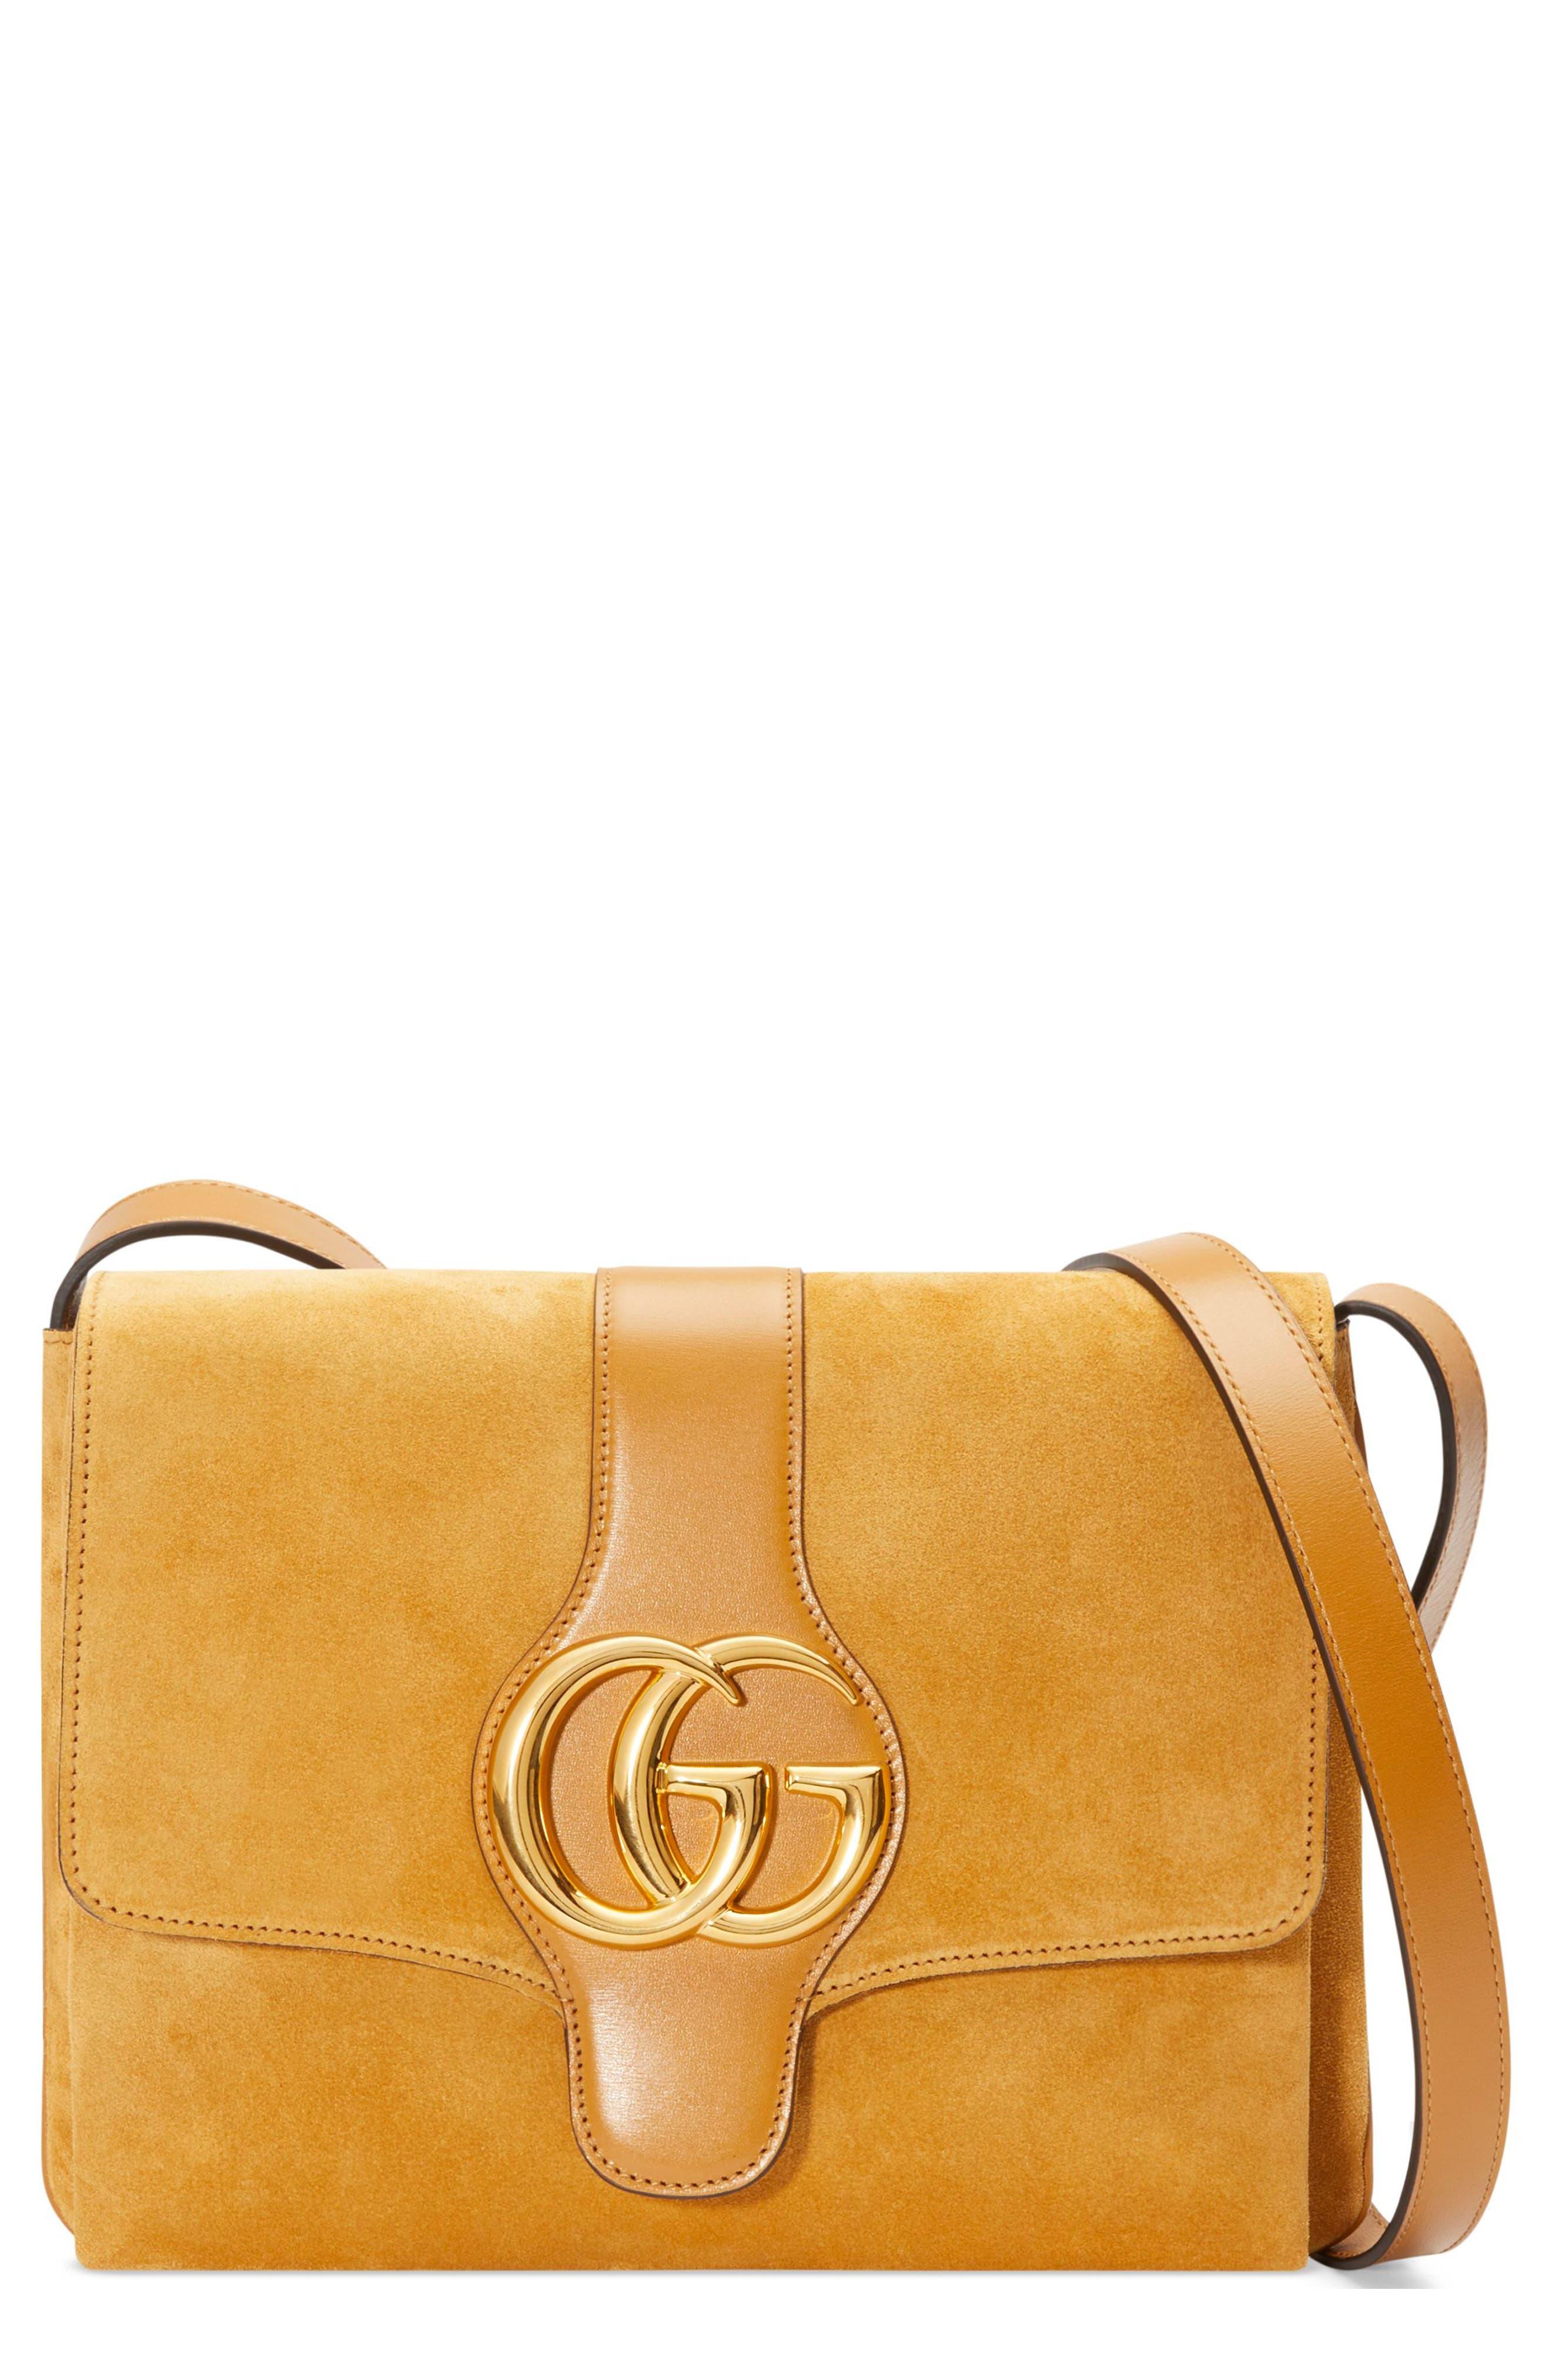 Medium Arli Shoulder Bag,                         Main,                         color, LIGHT COGNAC